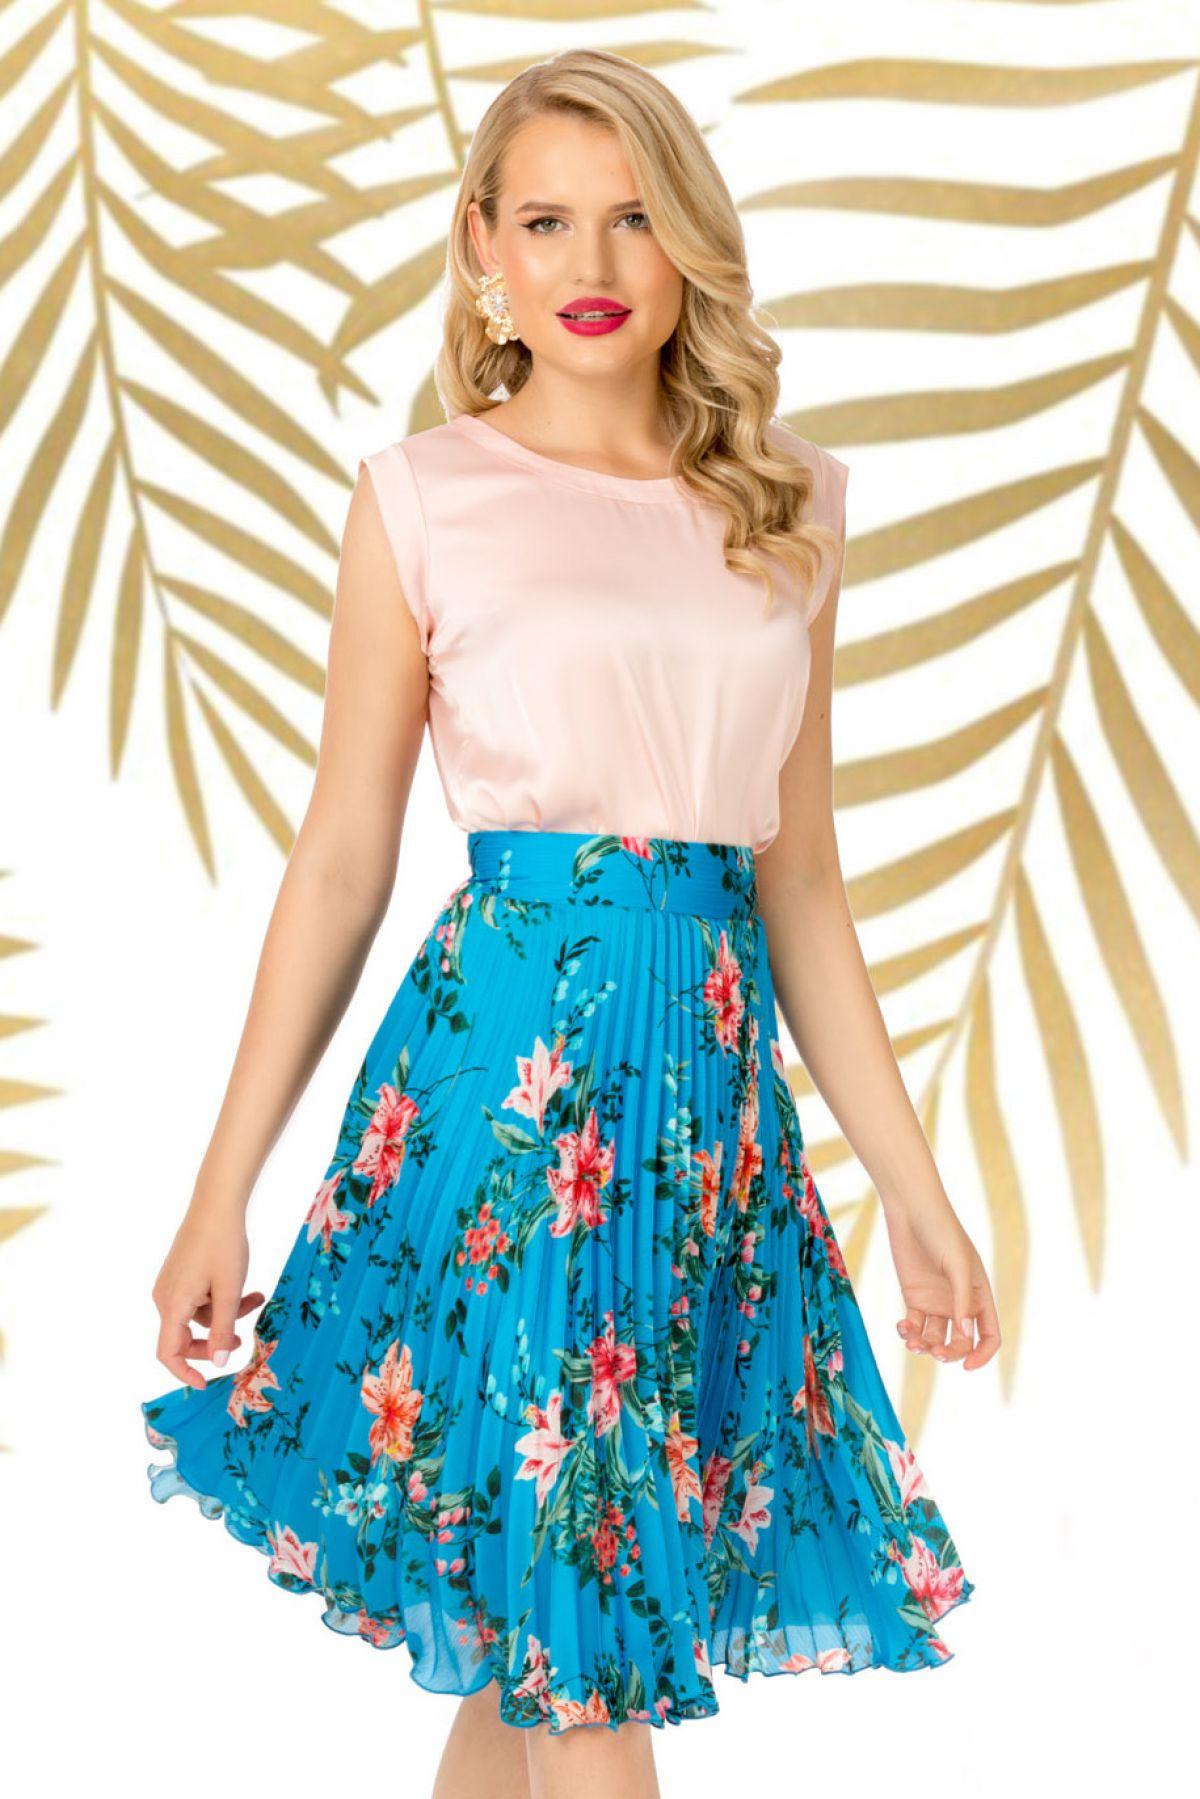 Fusta Pretty Girl plisata bleu cu imprimeu floral